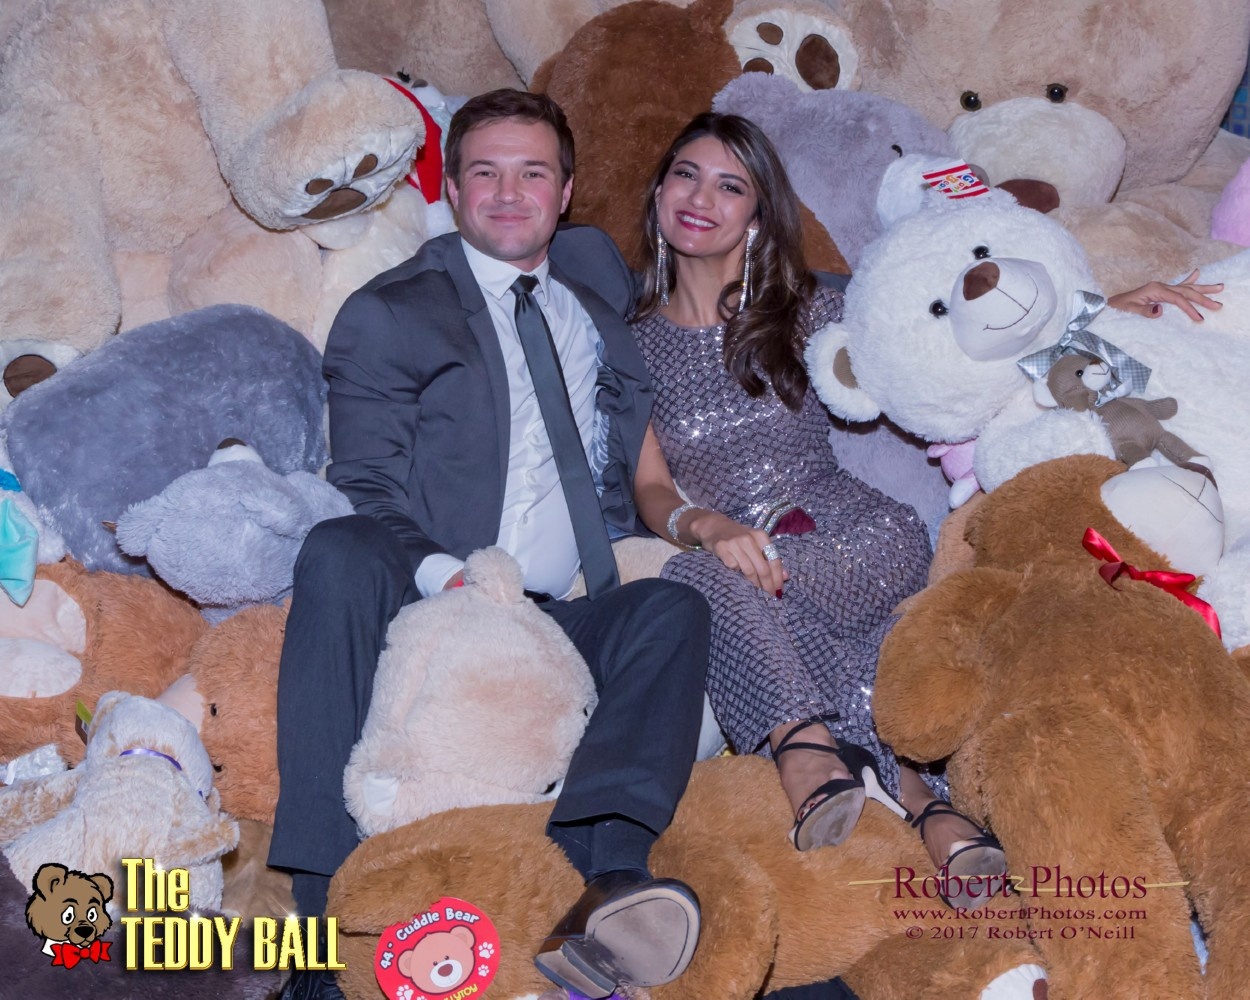 Teddy-Ball-2017-Robert-Photos- 58.jpg